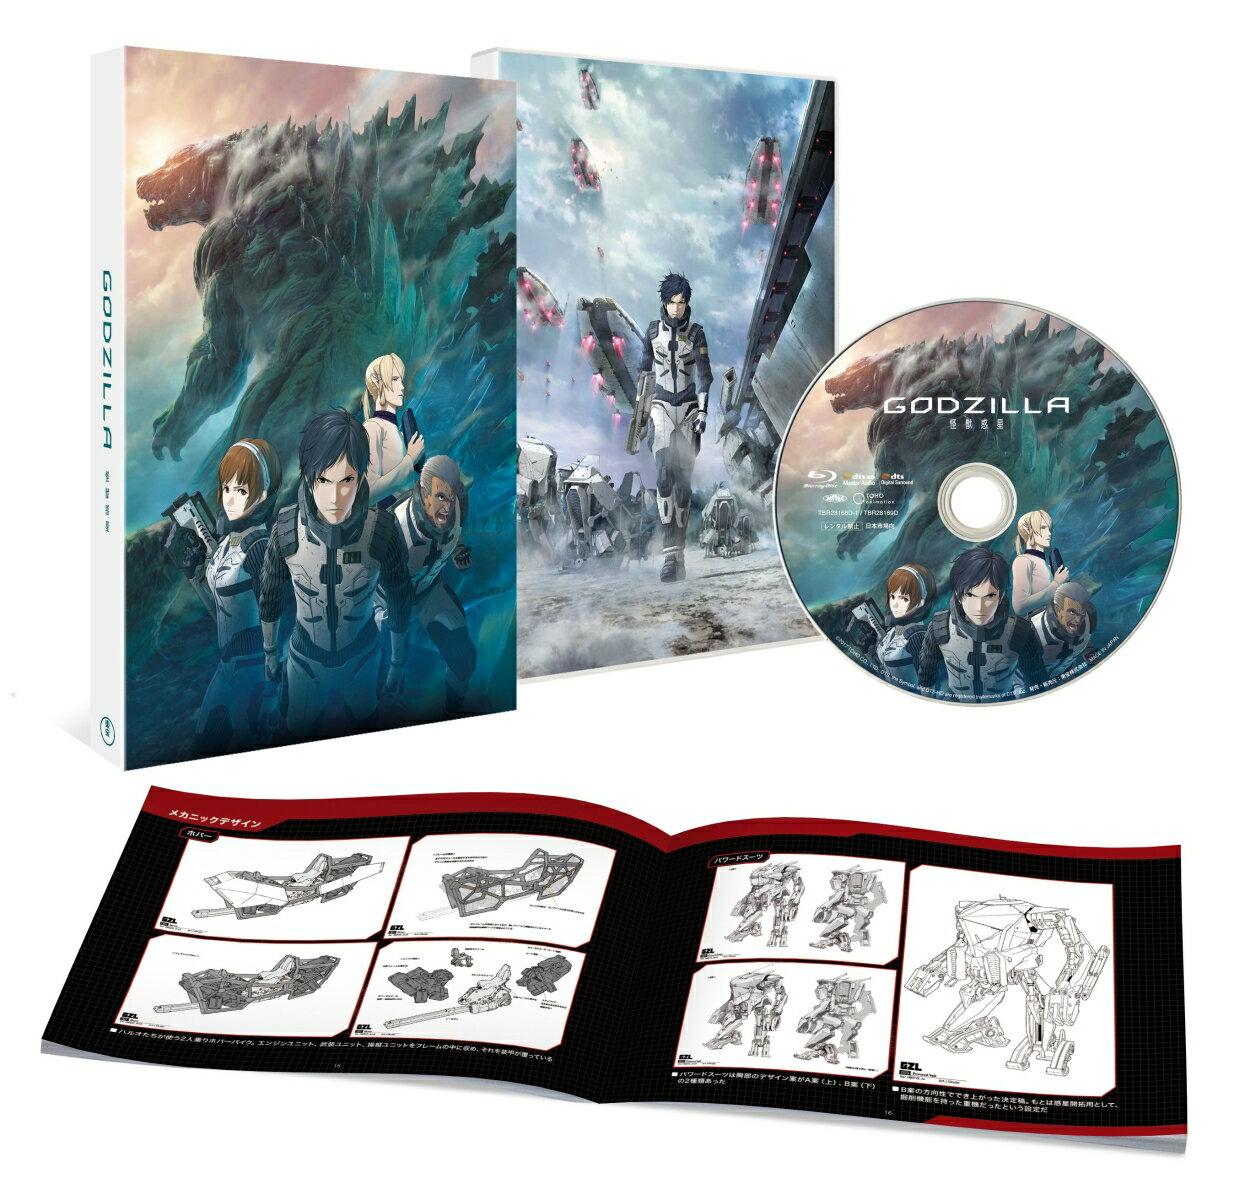 GODZILLA 怪獣惑星 Blu-ray スタンダード・エディション【Blu-ray】 [ 宮野真守 ]